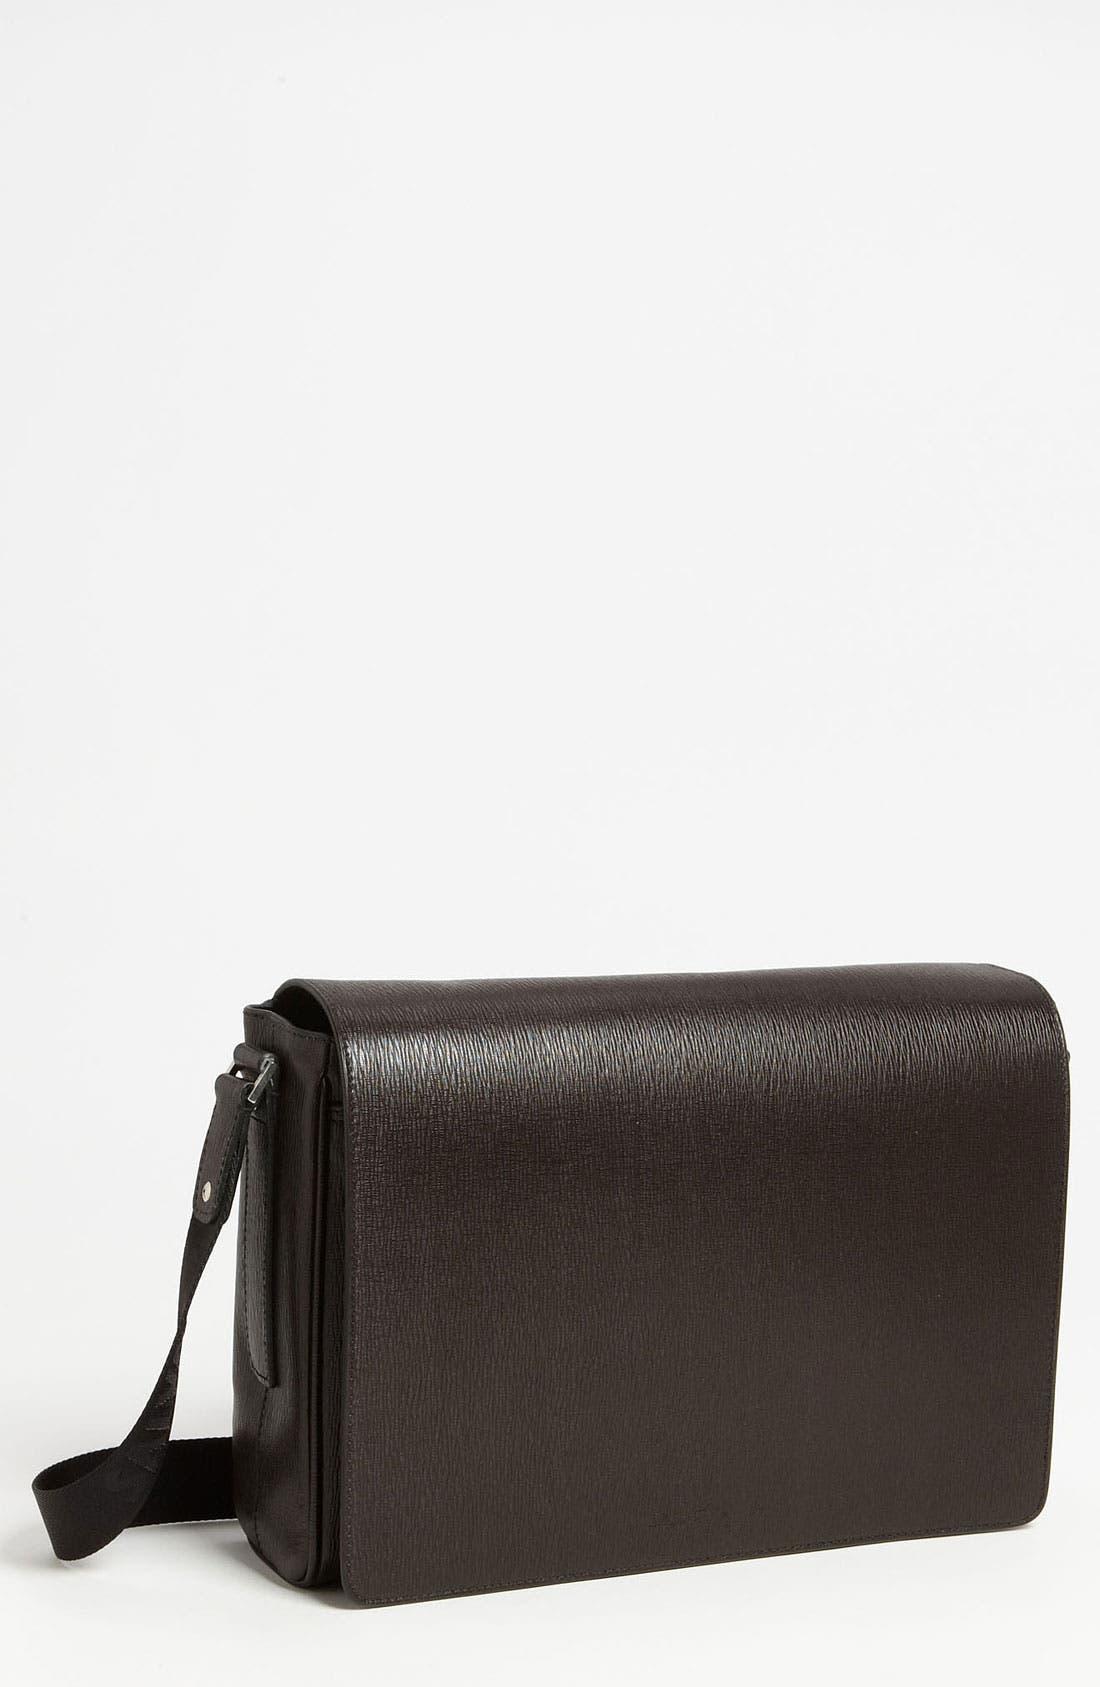 Alternate Image 1 Selected - Salvatore Ferragamo 'Revival' Messenger Bag